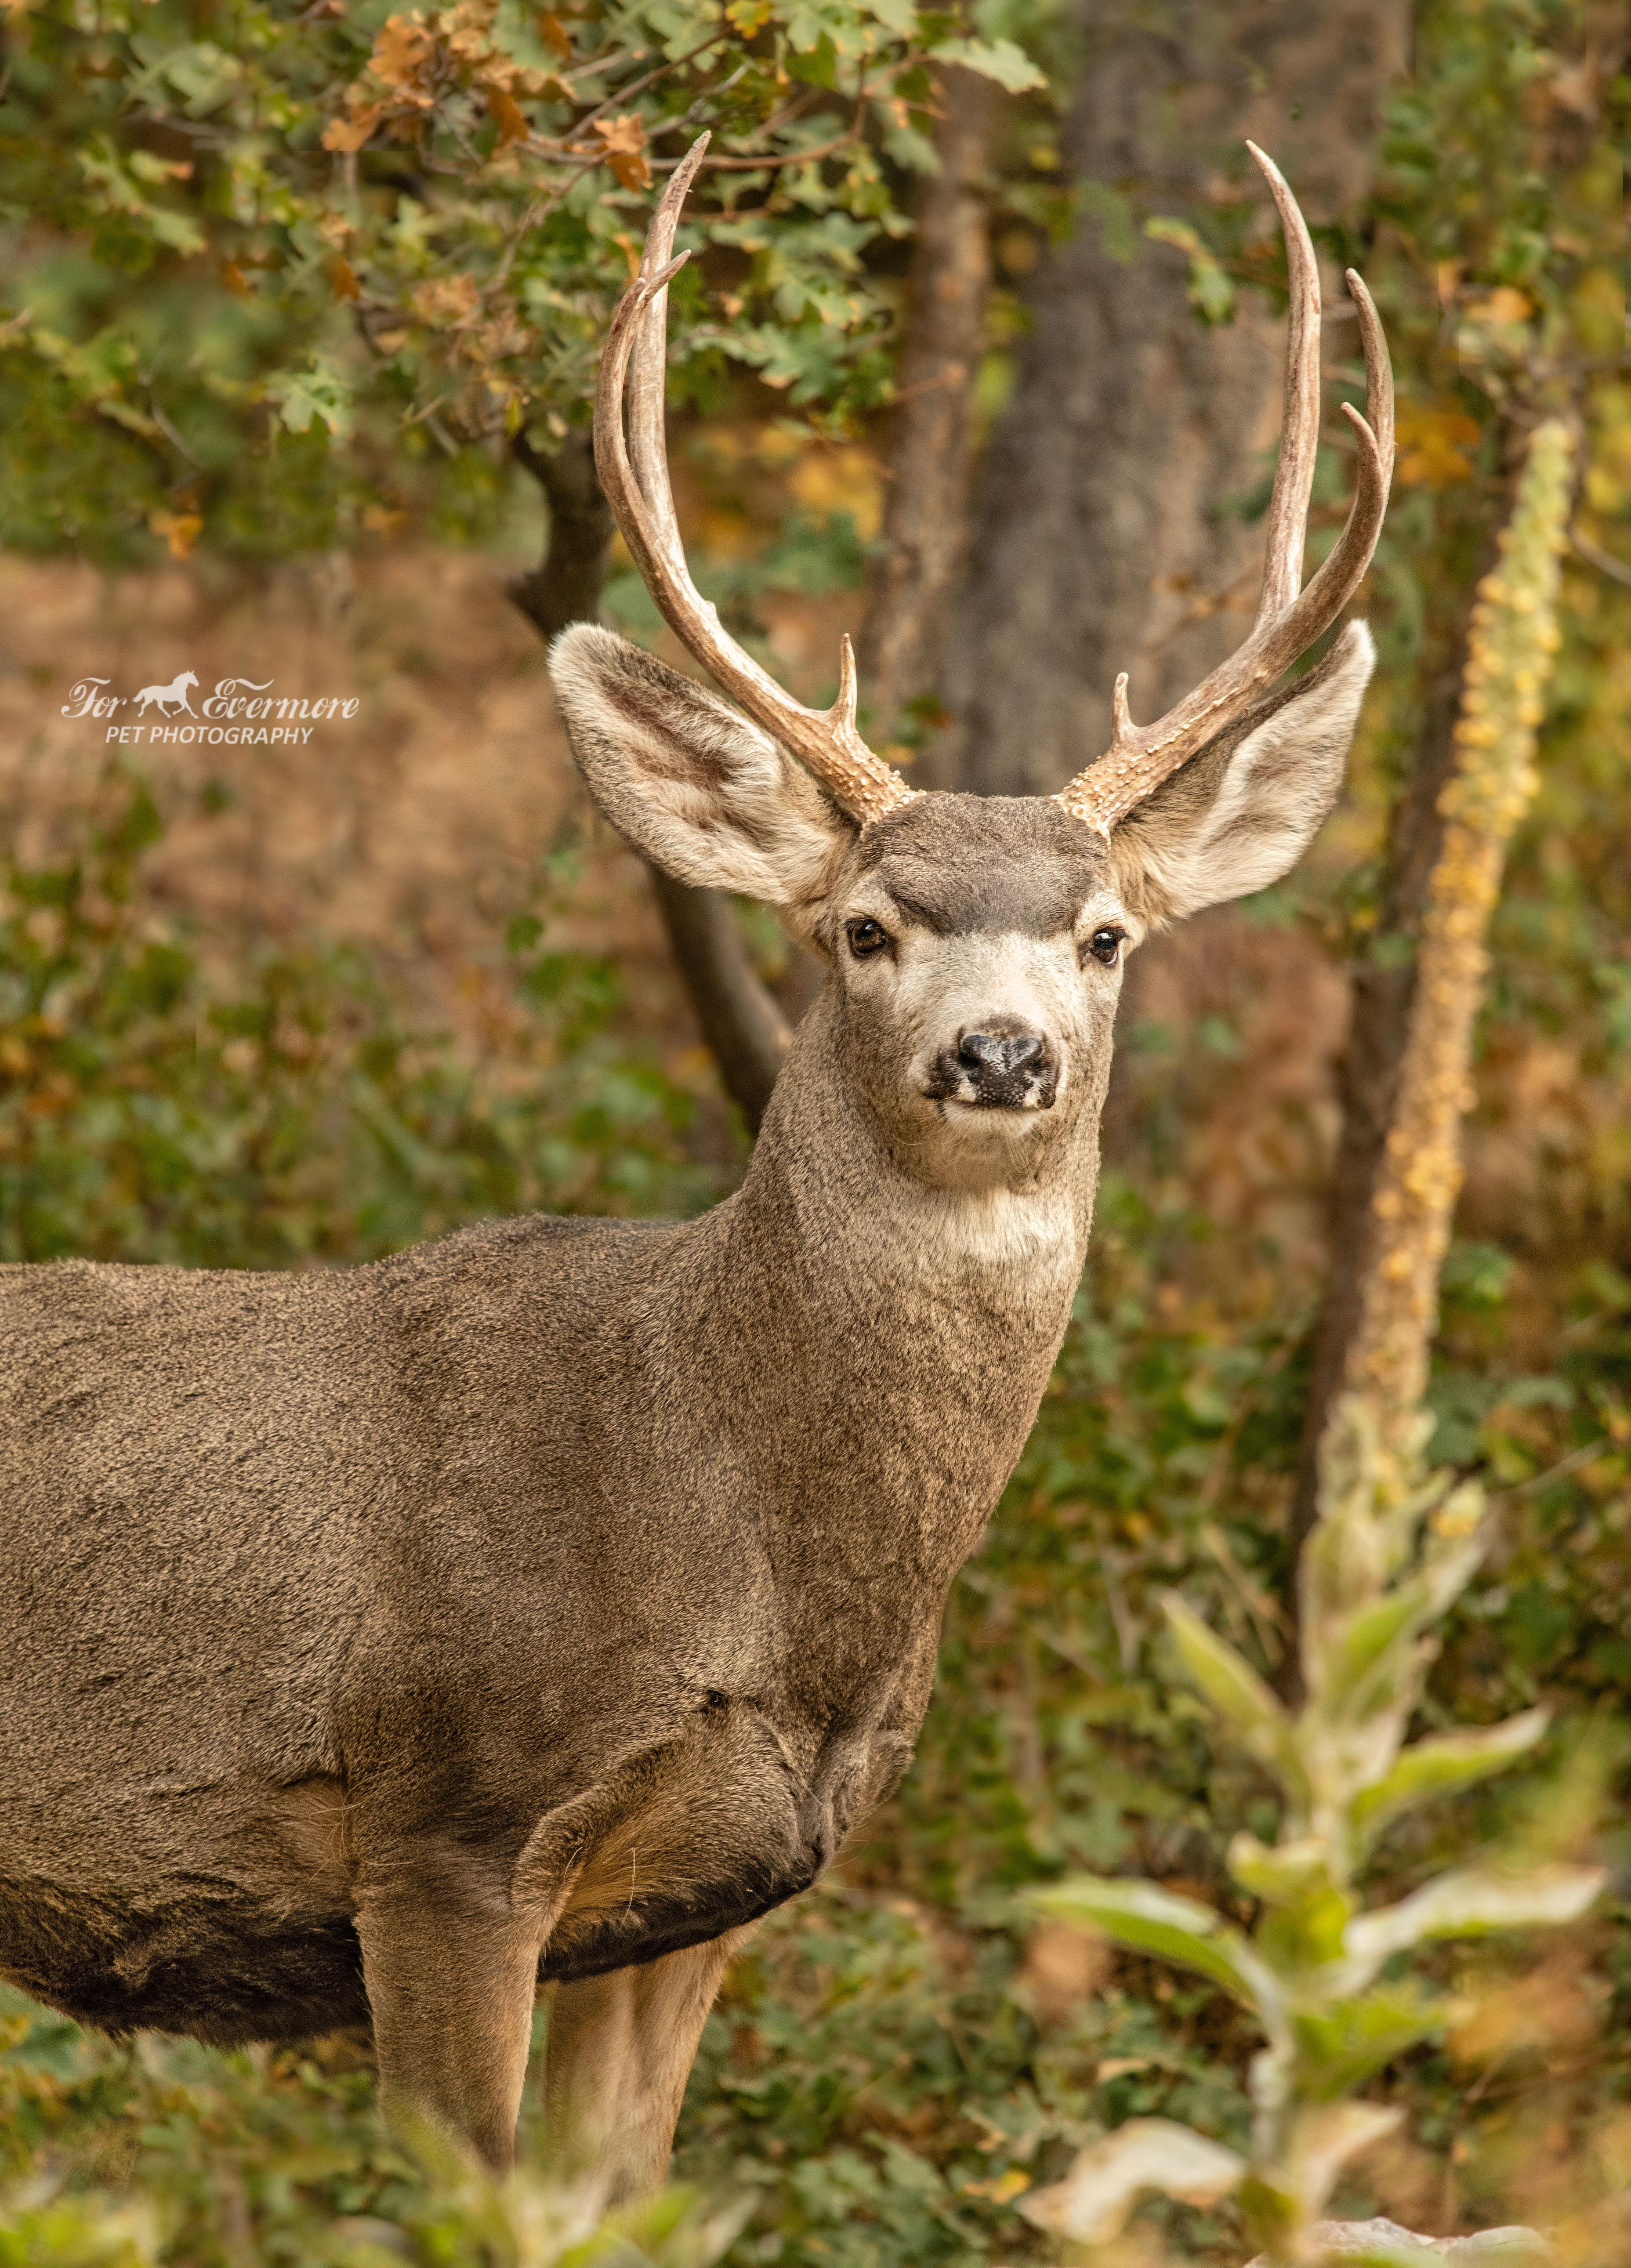 Young Mule Deer posing for me